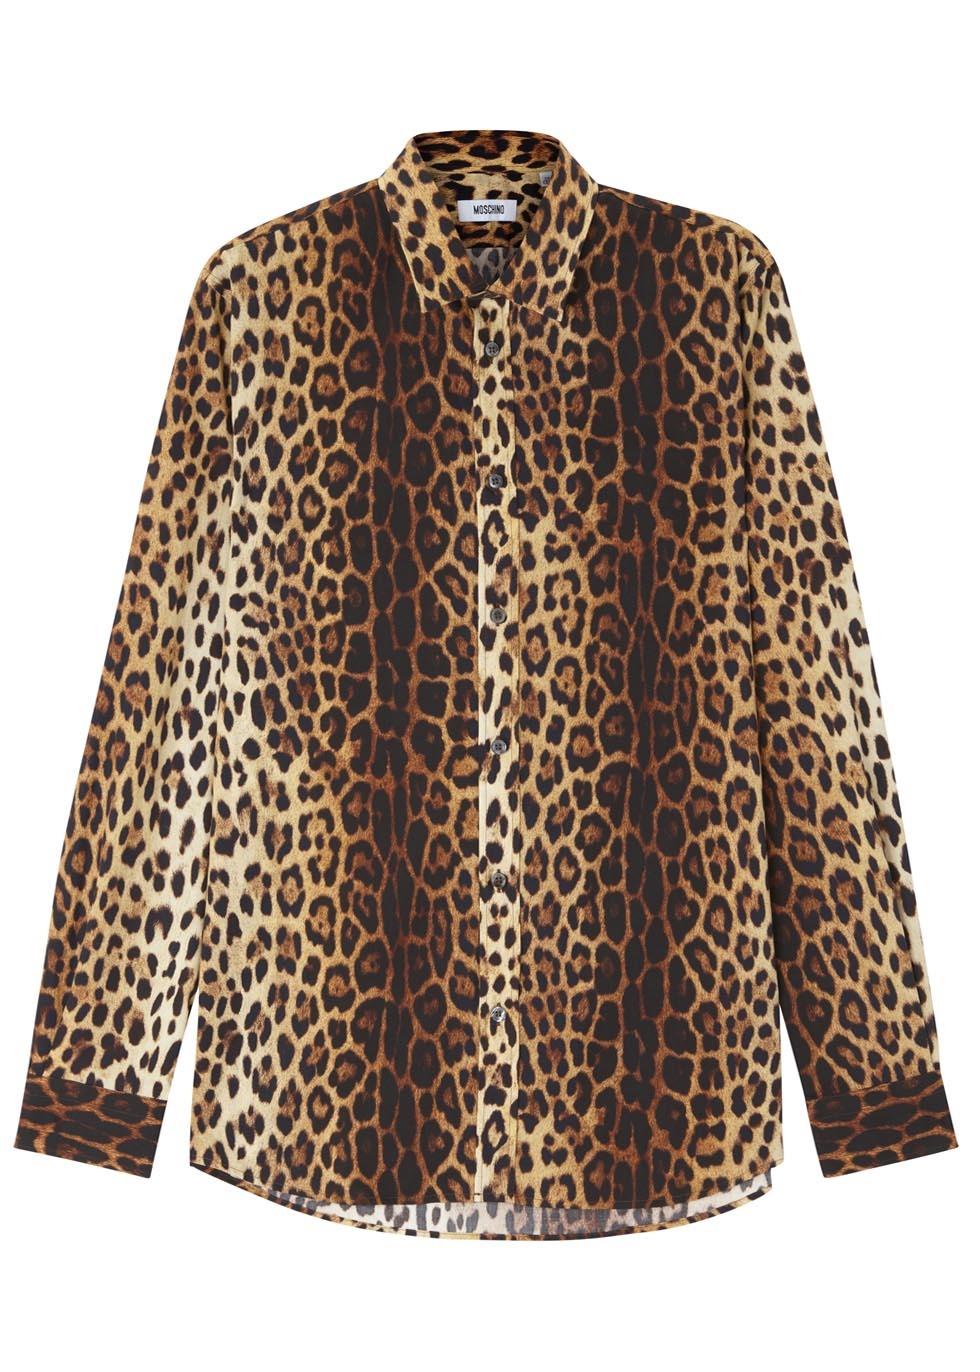 bcff4356a03151 Moschino Leopard Print Cotton Shirt for Men - Lyst